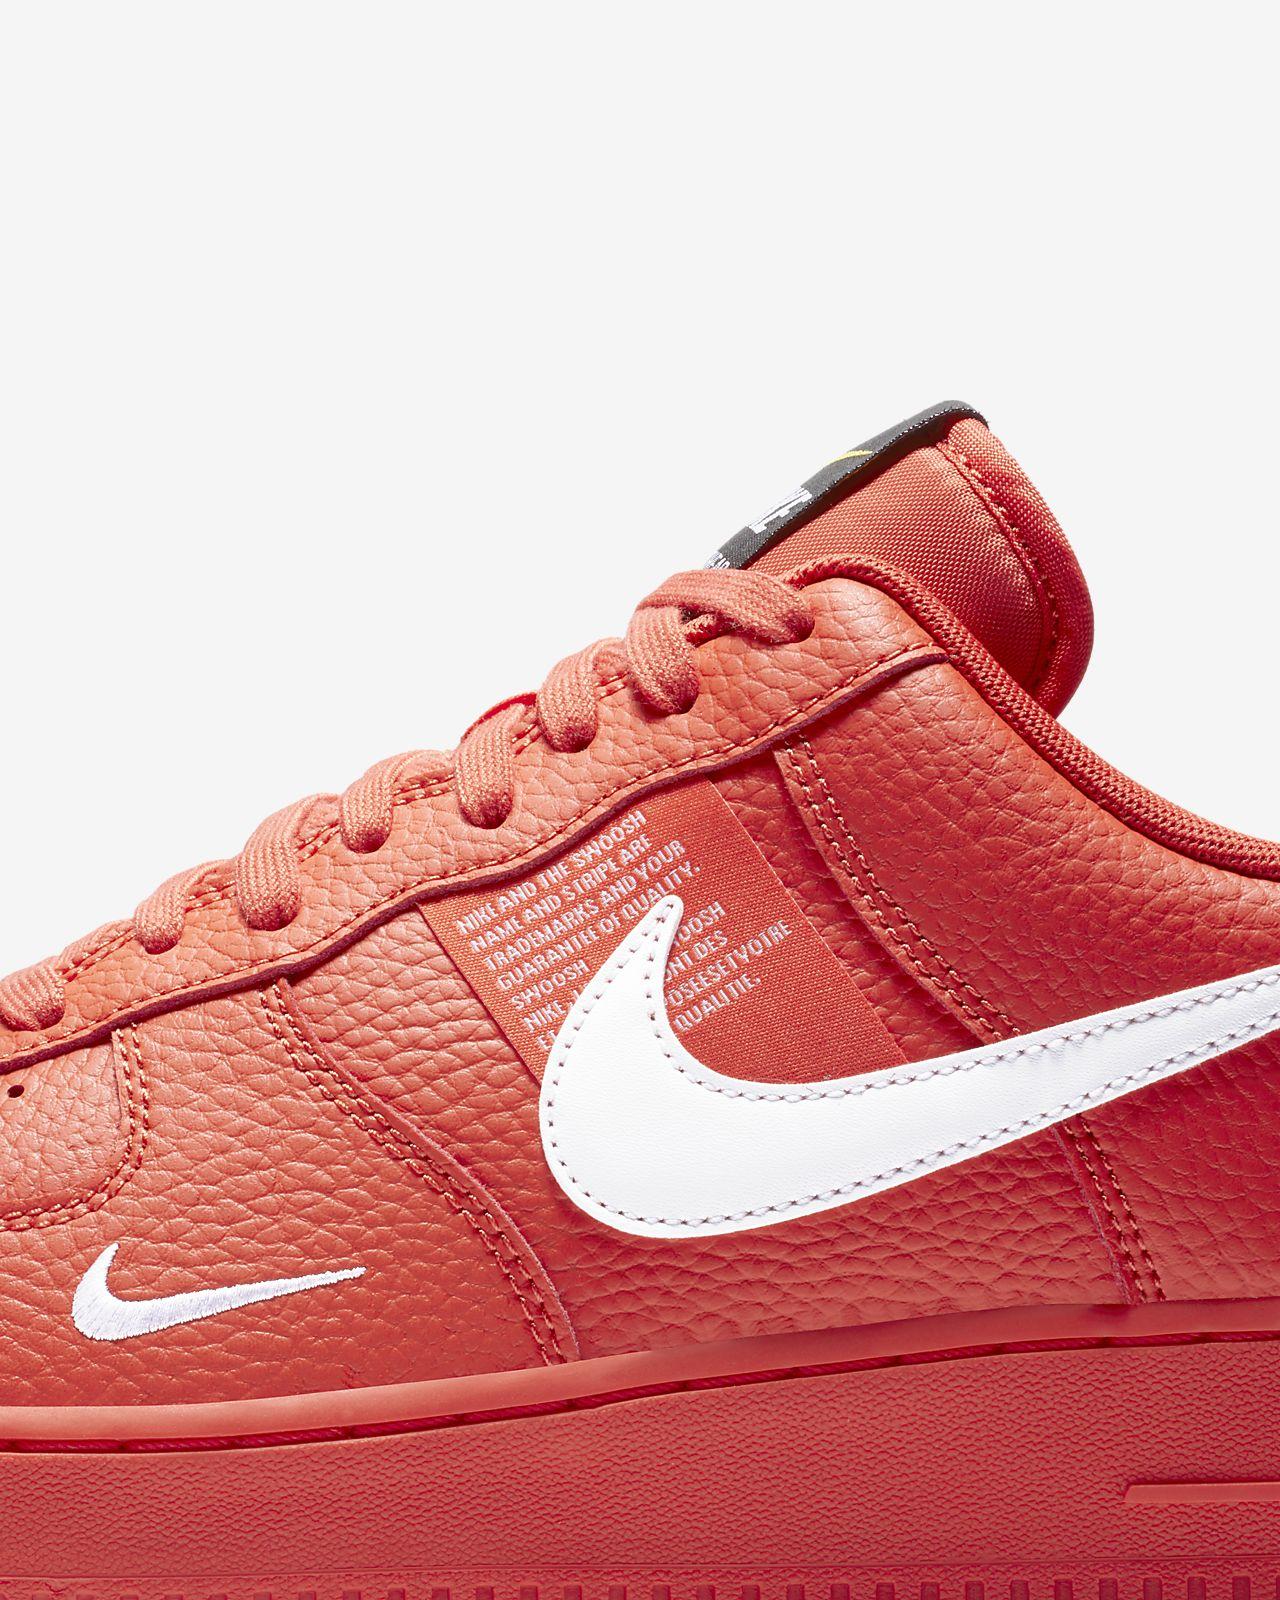 half off 3794f cee7e ... Nike Air Force 1  07 LV8 Utility Men s Shoe